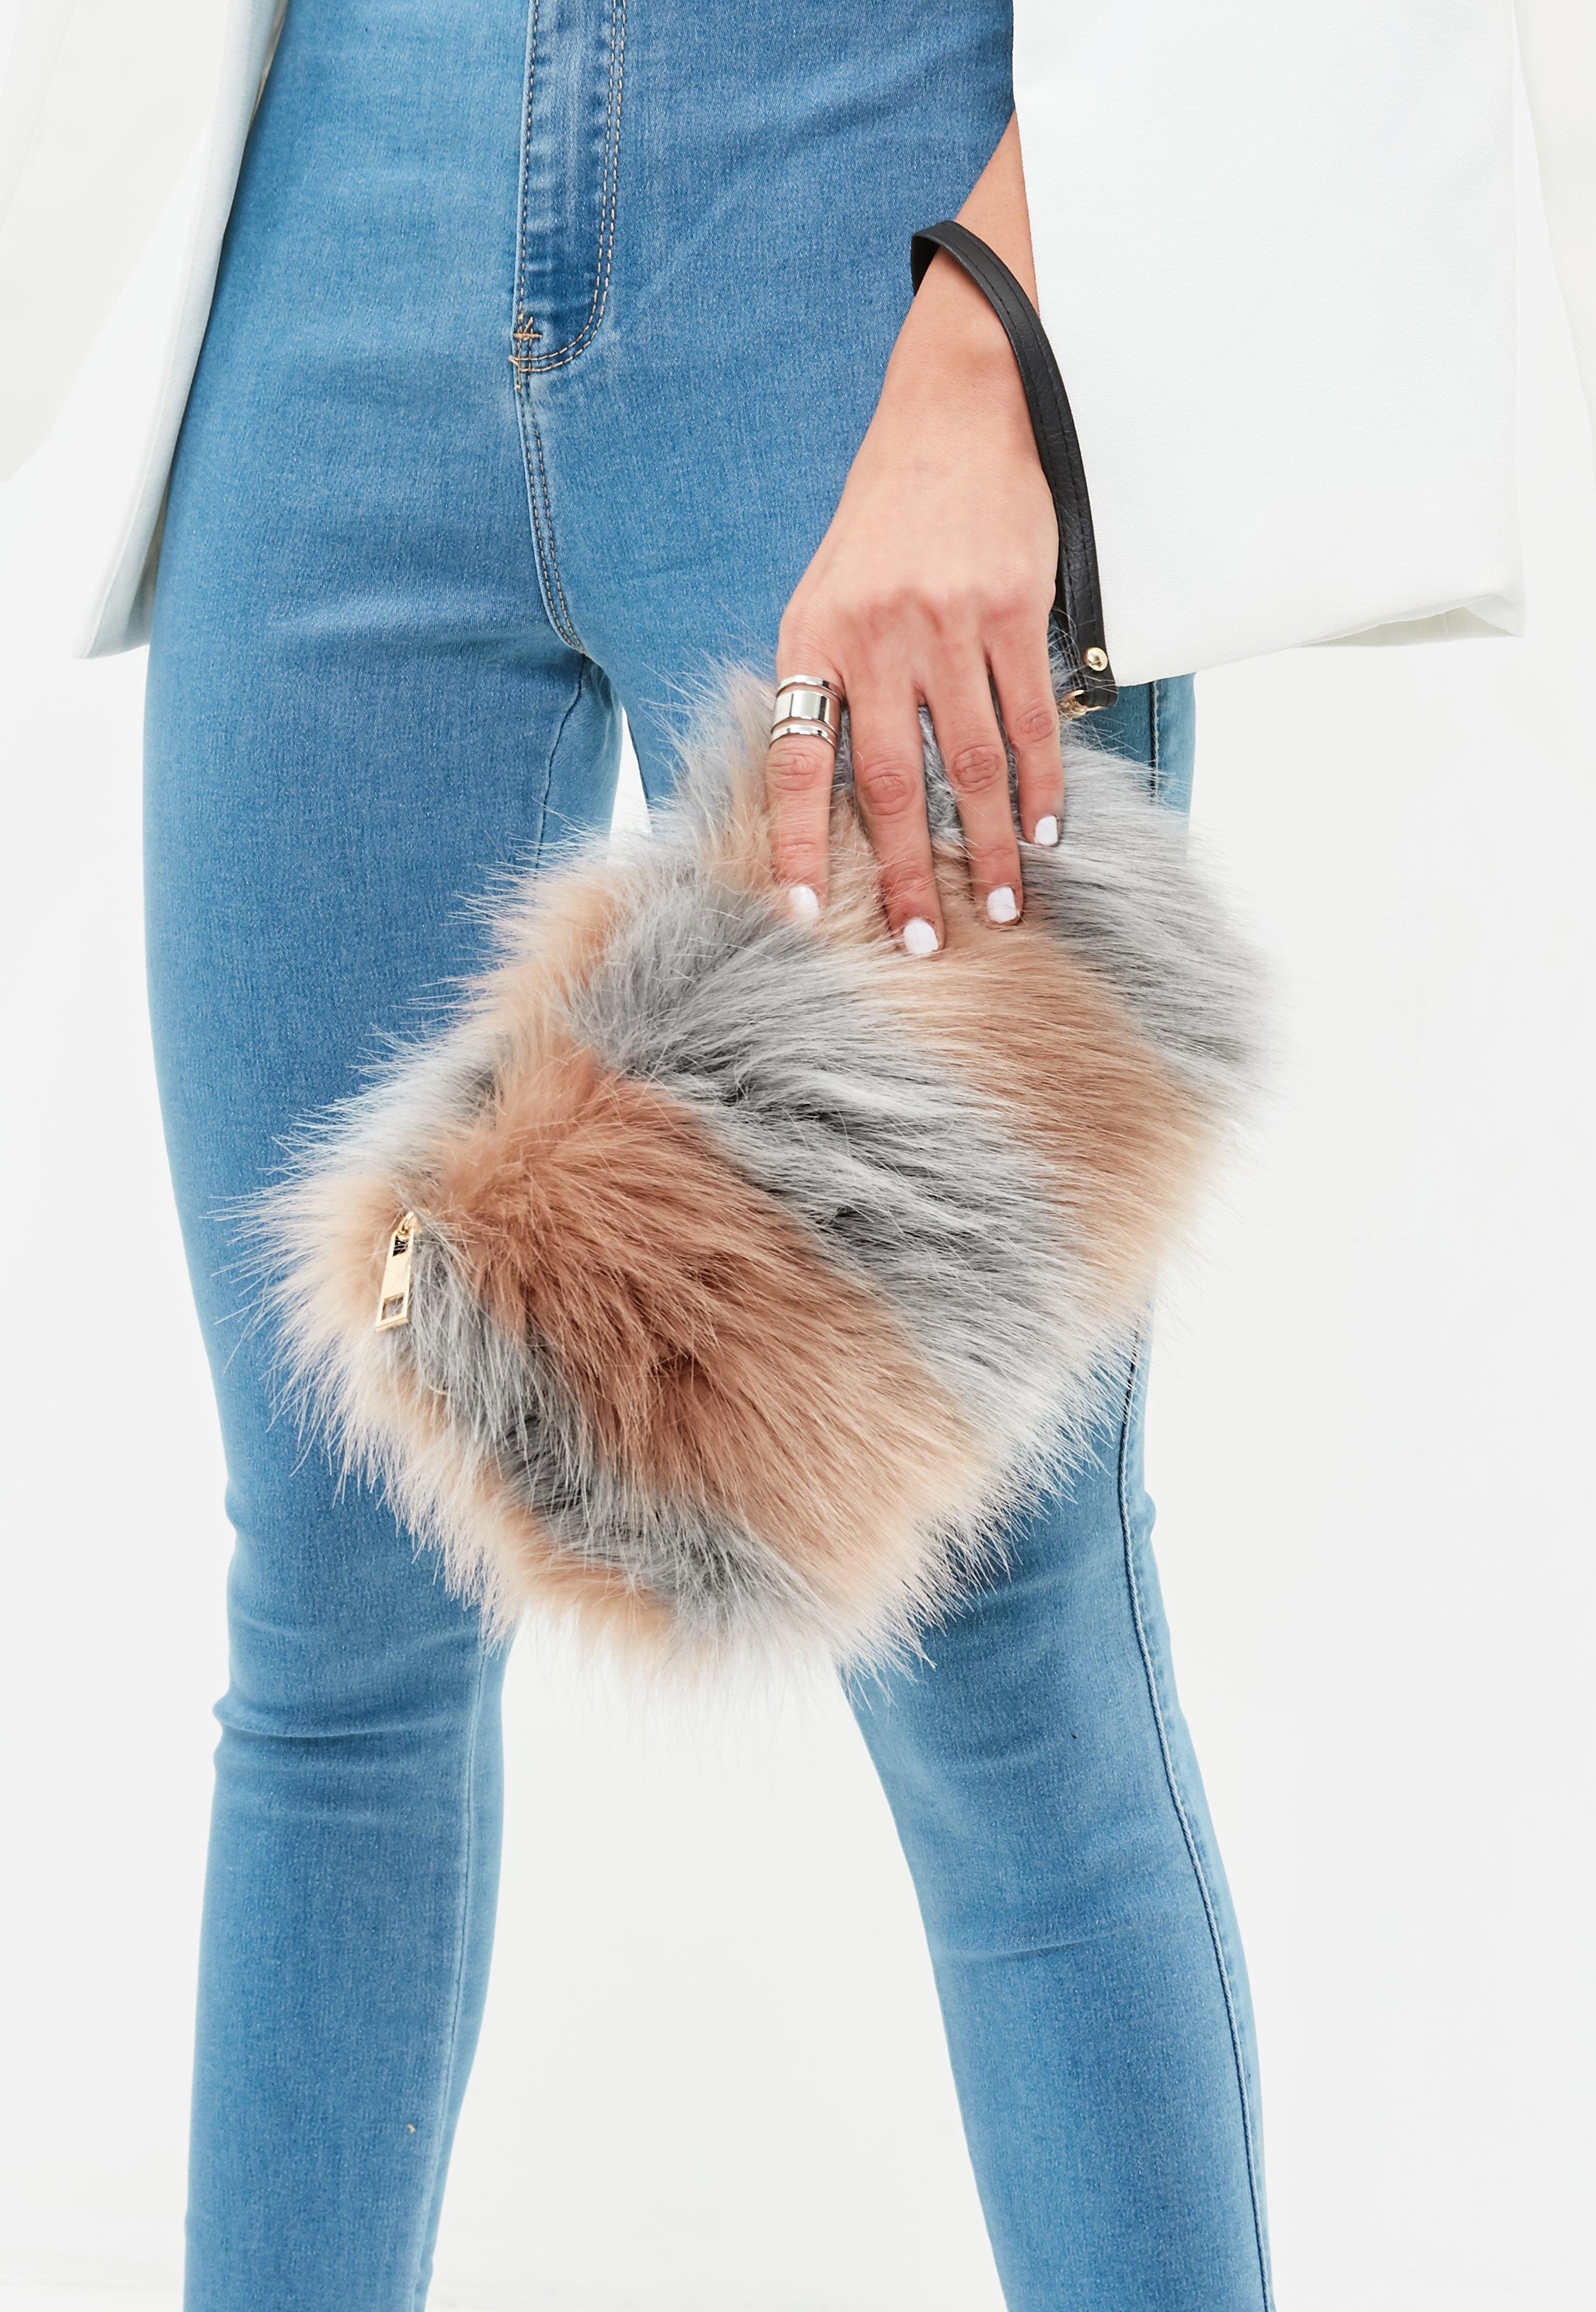 Lyst - Missguided Pink Fluffy Clutch Bag in Pink 38af7bdfef